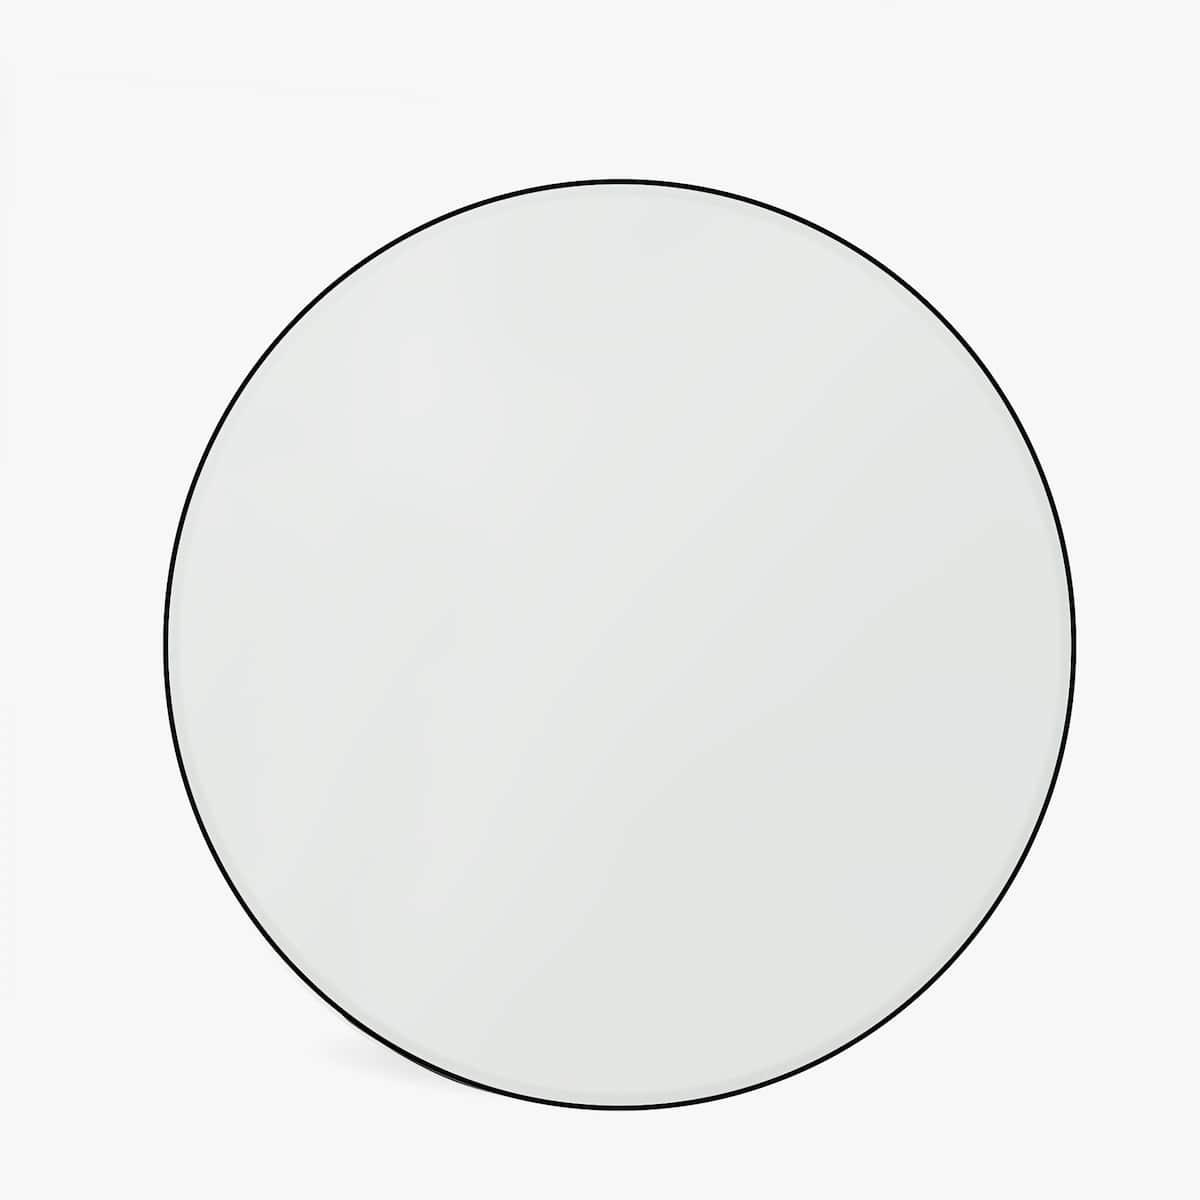 Black rim large mirror    - £79.99